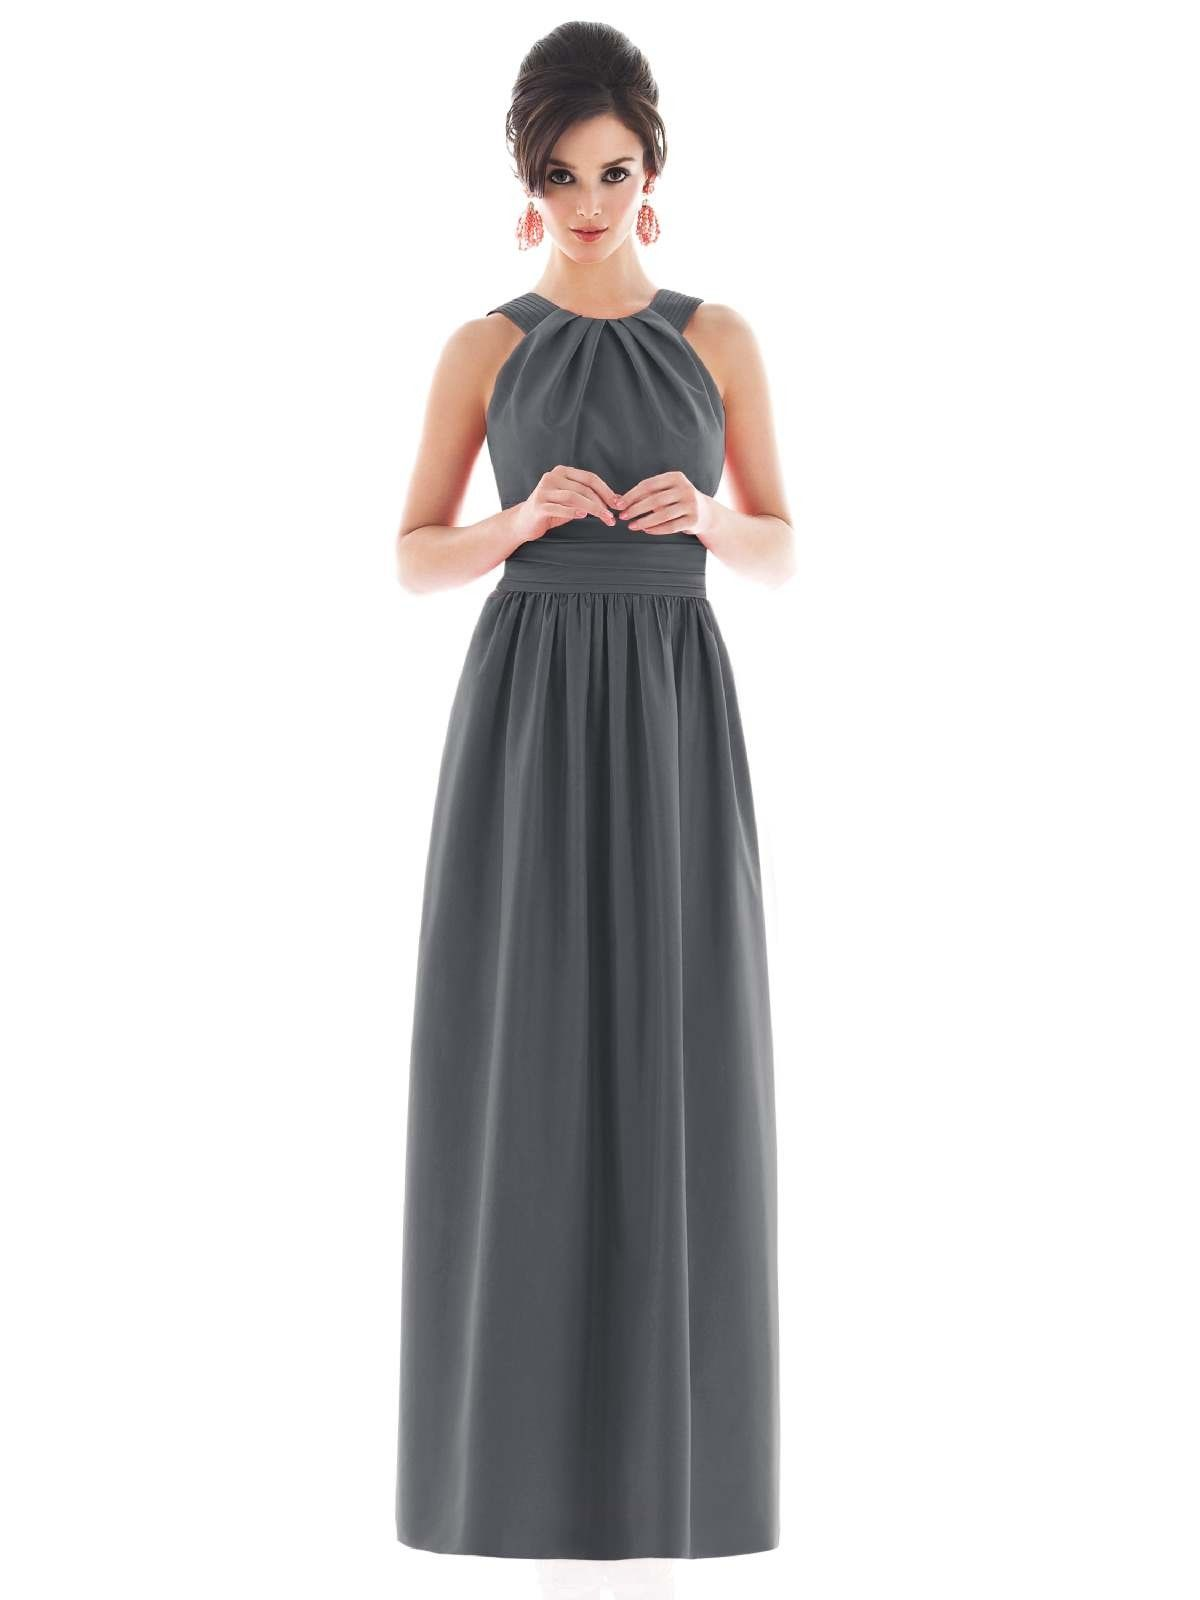 Peau De Soie Halter Pleated Bodice Formal Long Dress   A&M ...